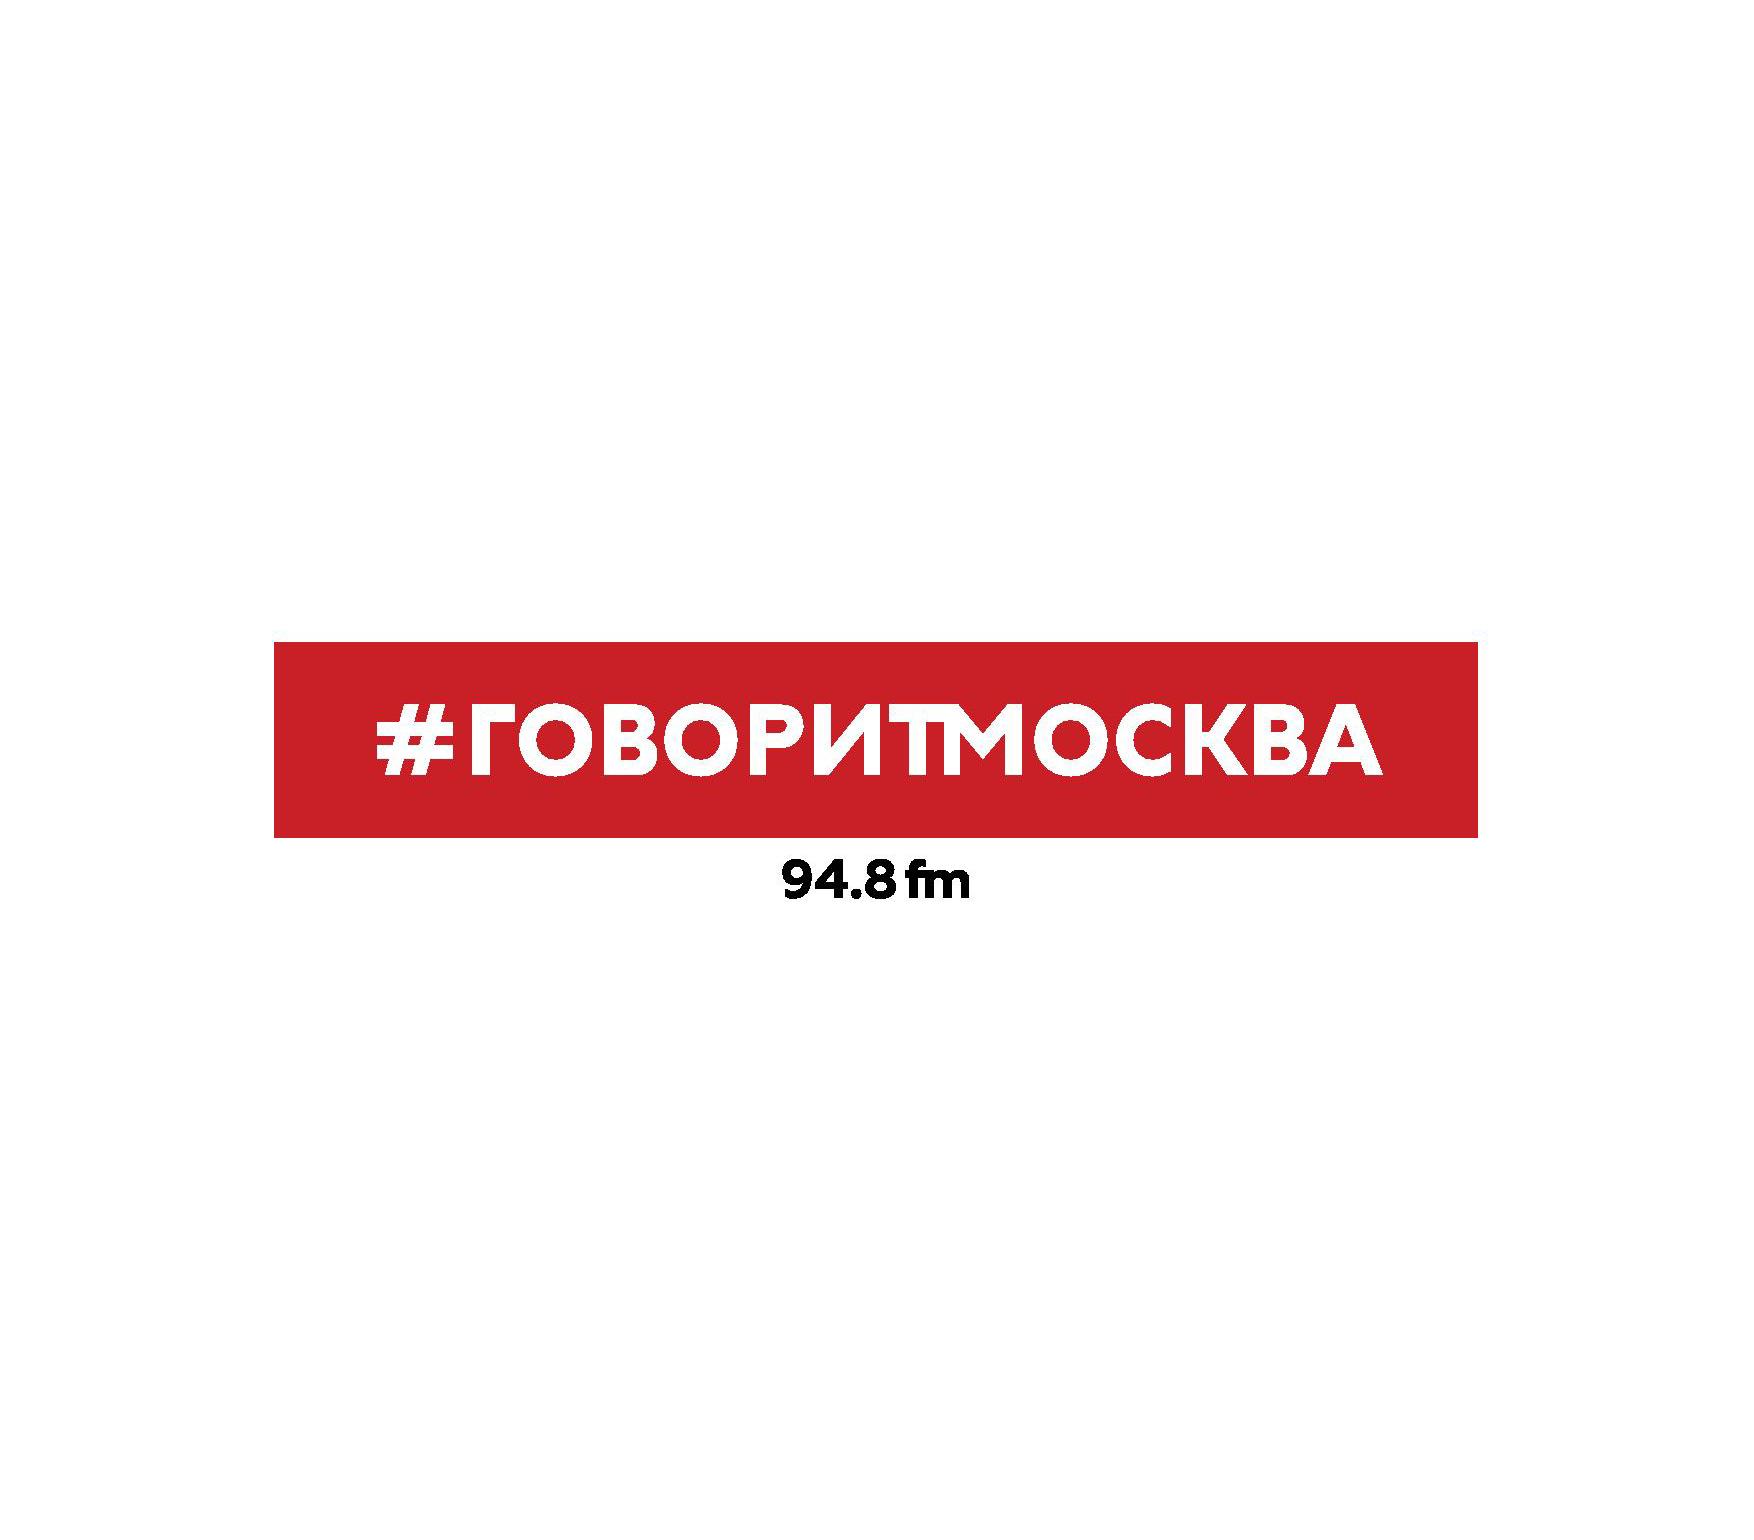 Макс Челноков 12 апреля. Максим Кононенко макс челноков 14 апреля андрей орлов